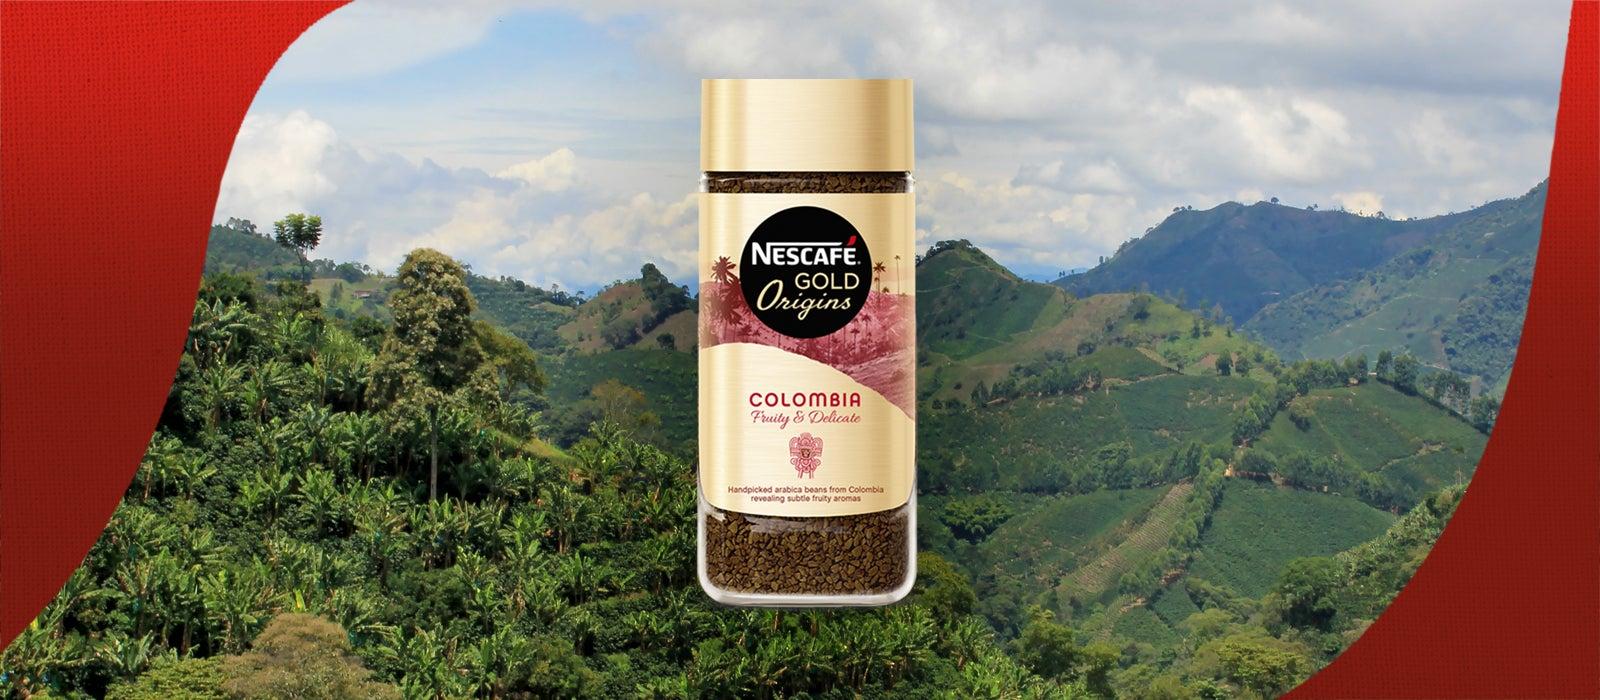 Nescafe Gold Origins jar